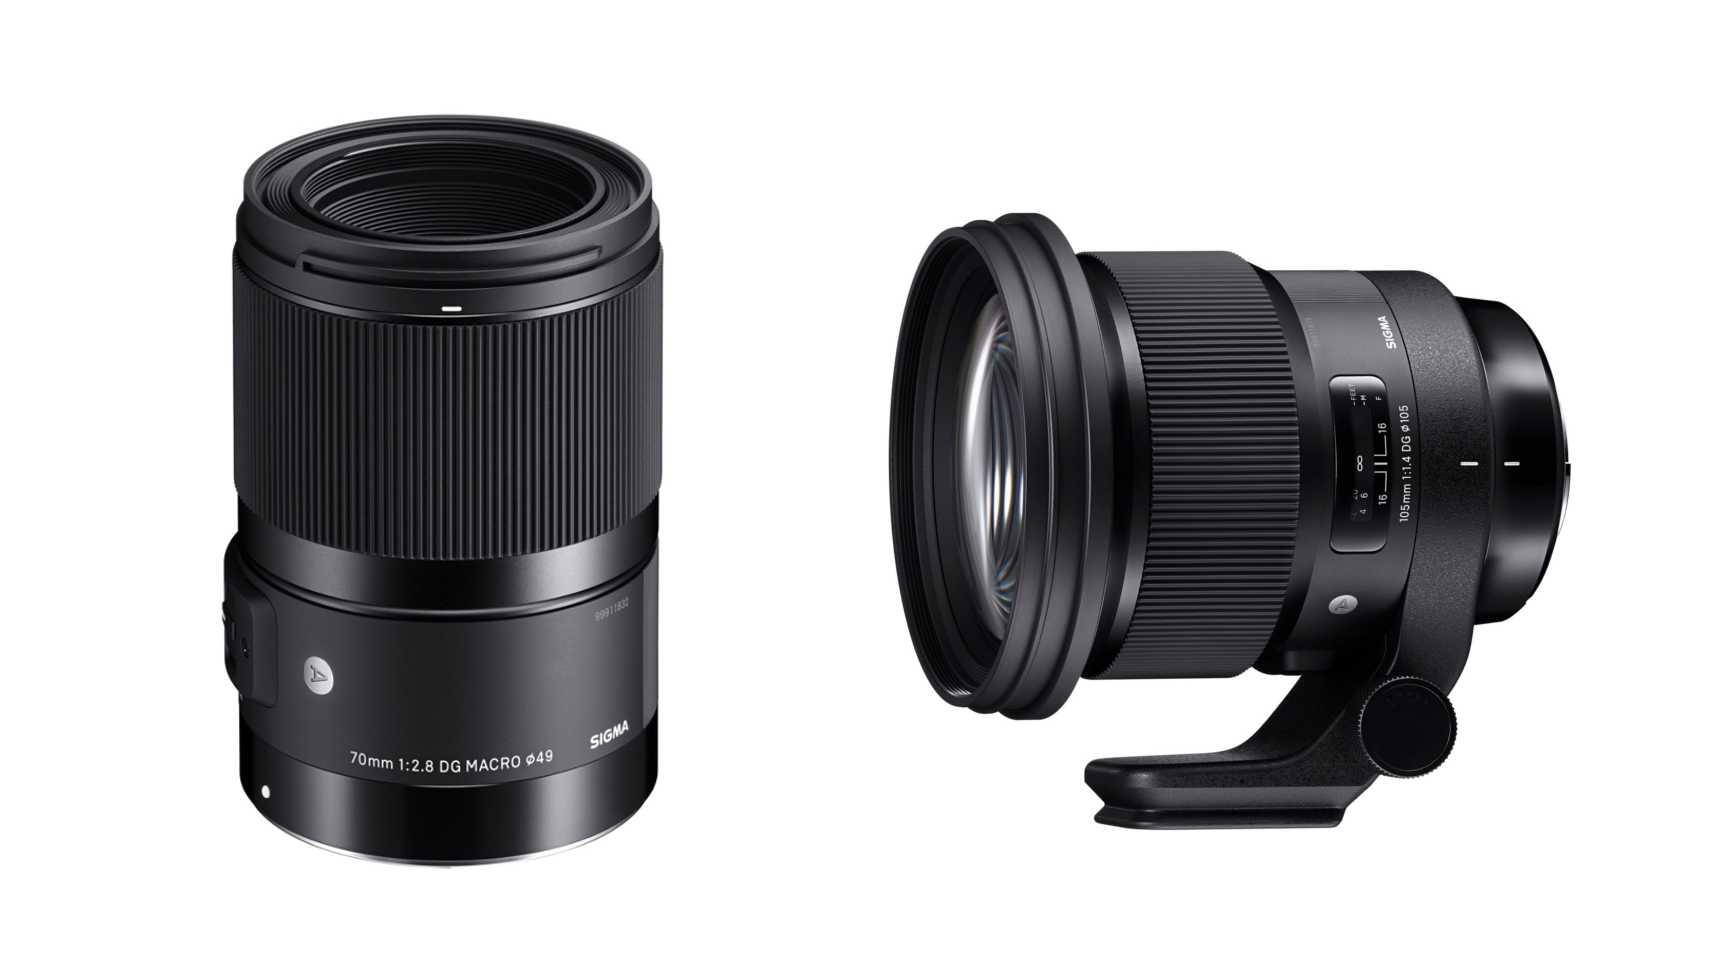 Sigma kündigt Objektive der Art-Serie auch für Sony E-Mount an